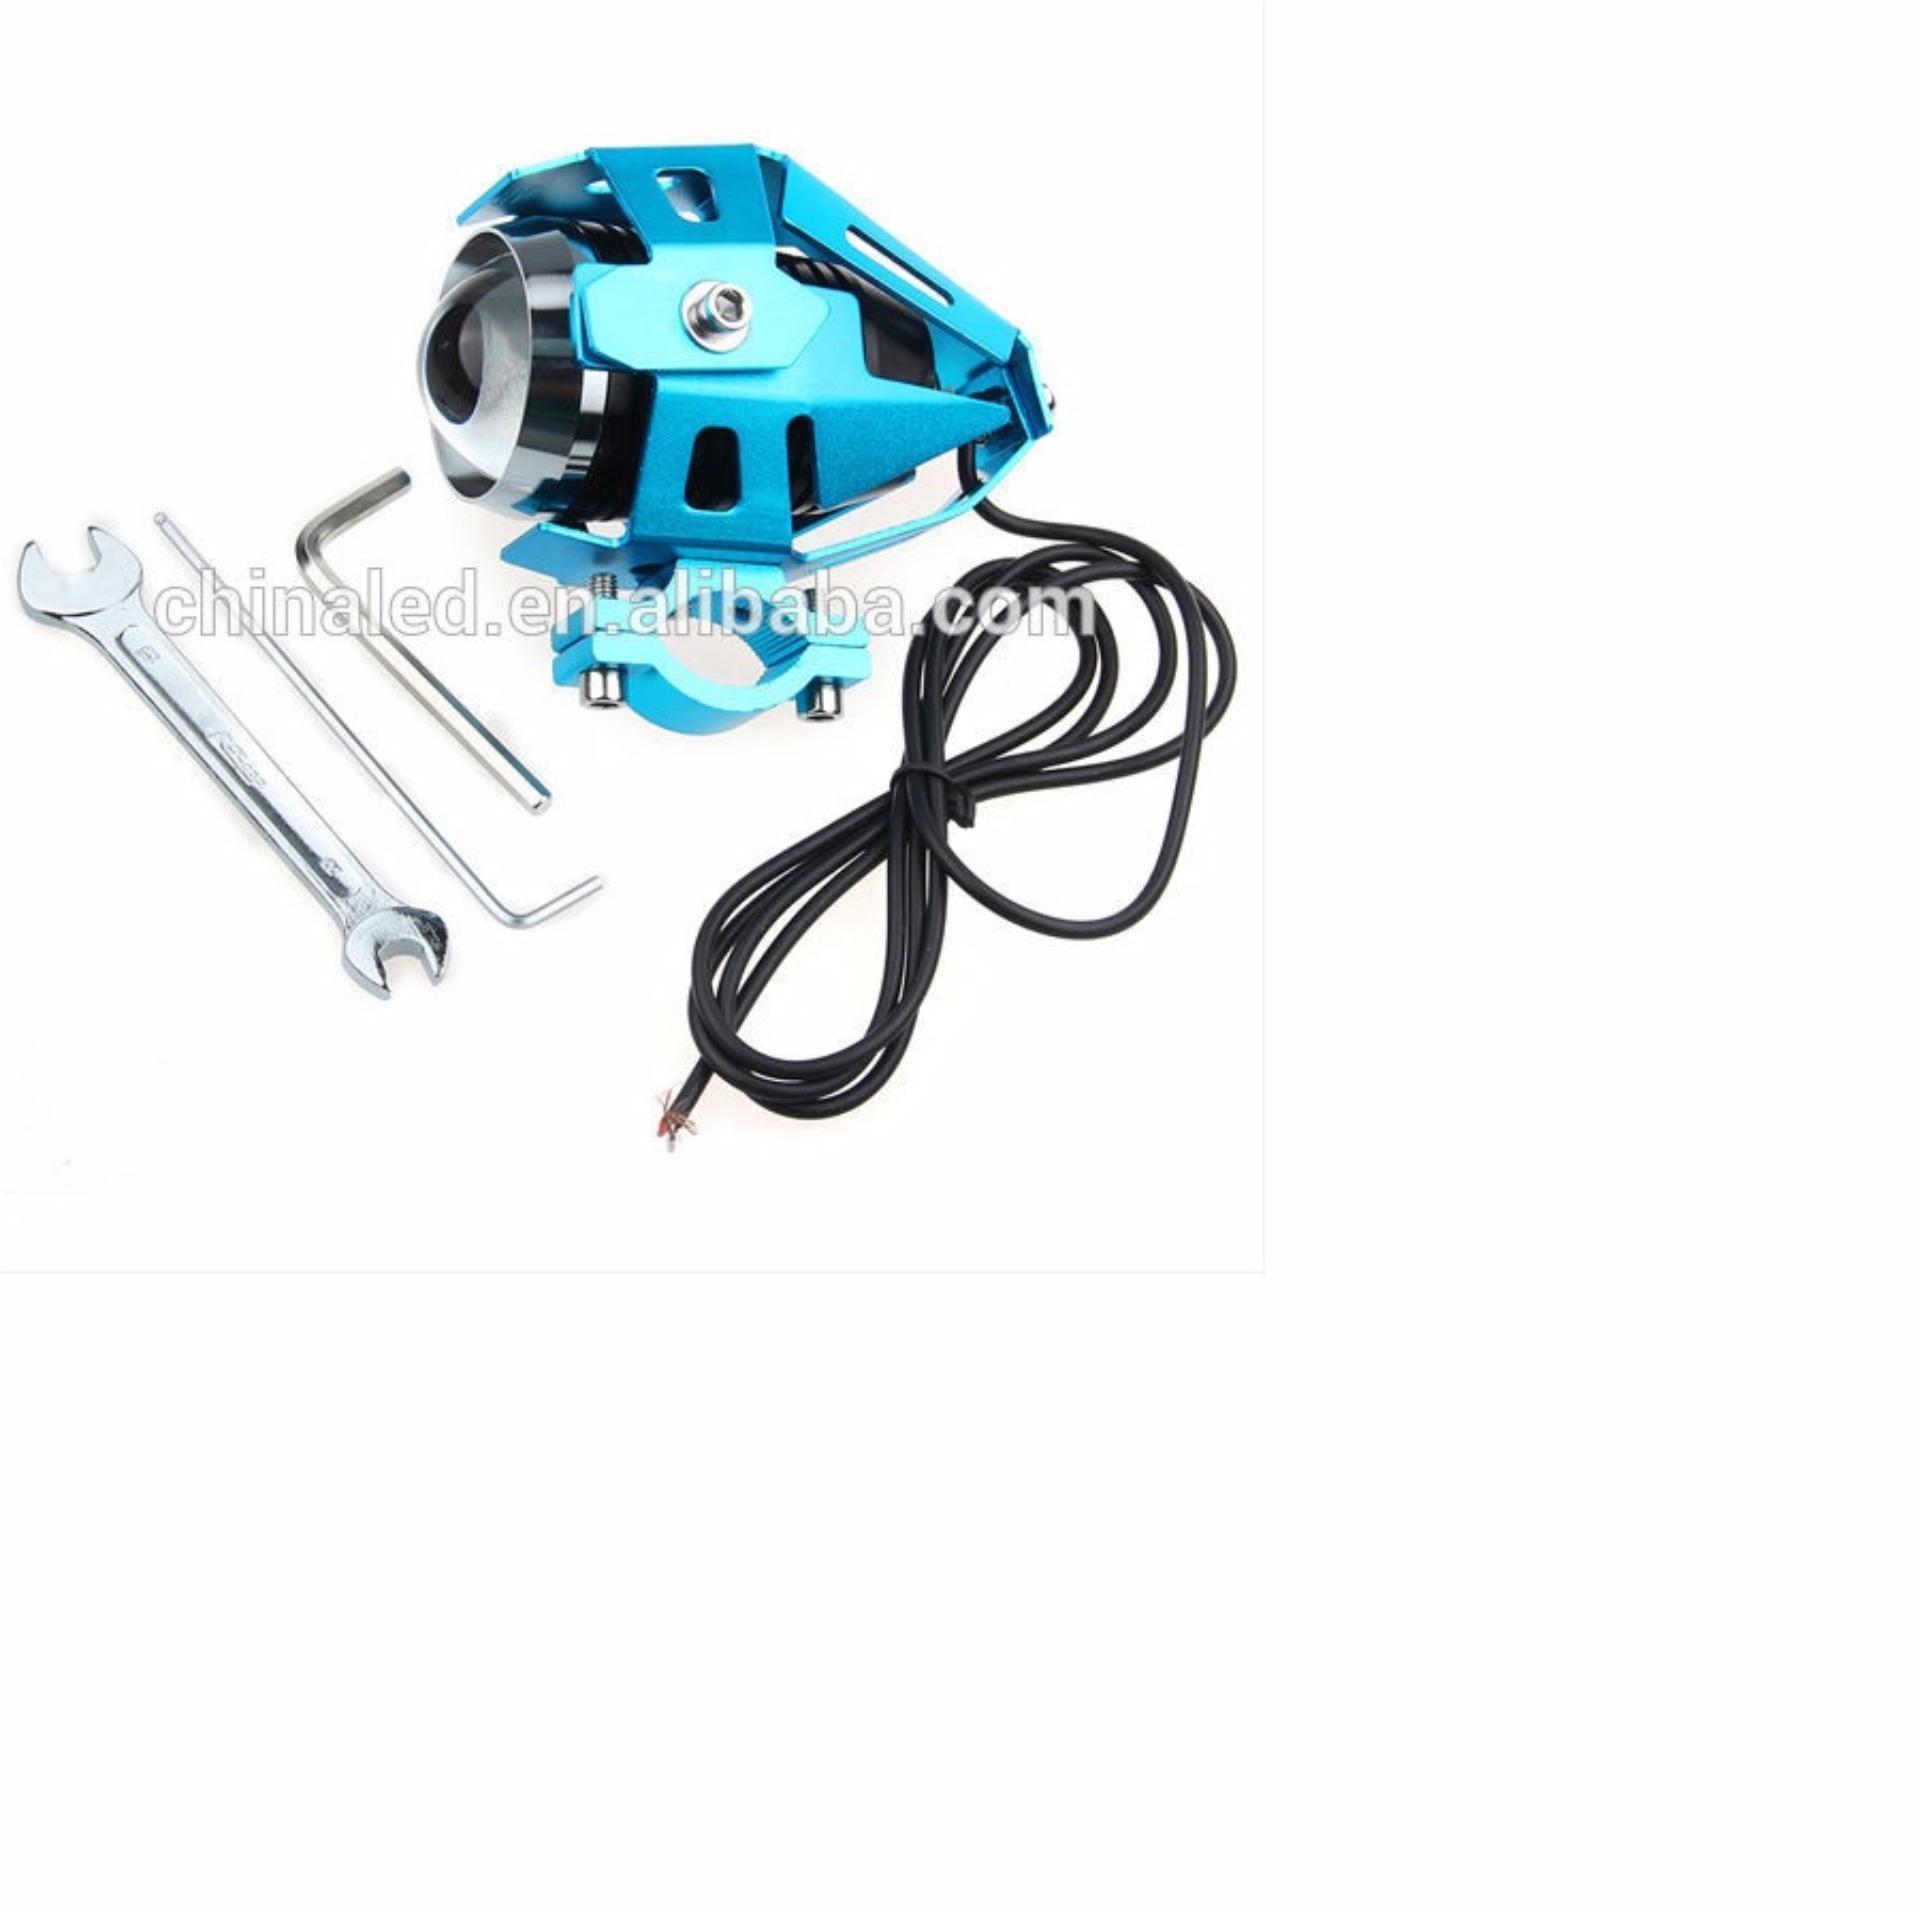 Lampu Sorot Tembak Led Cree U5 Transformer Light Motor- biru